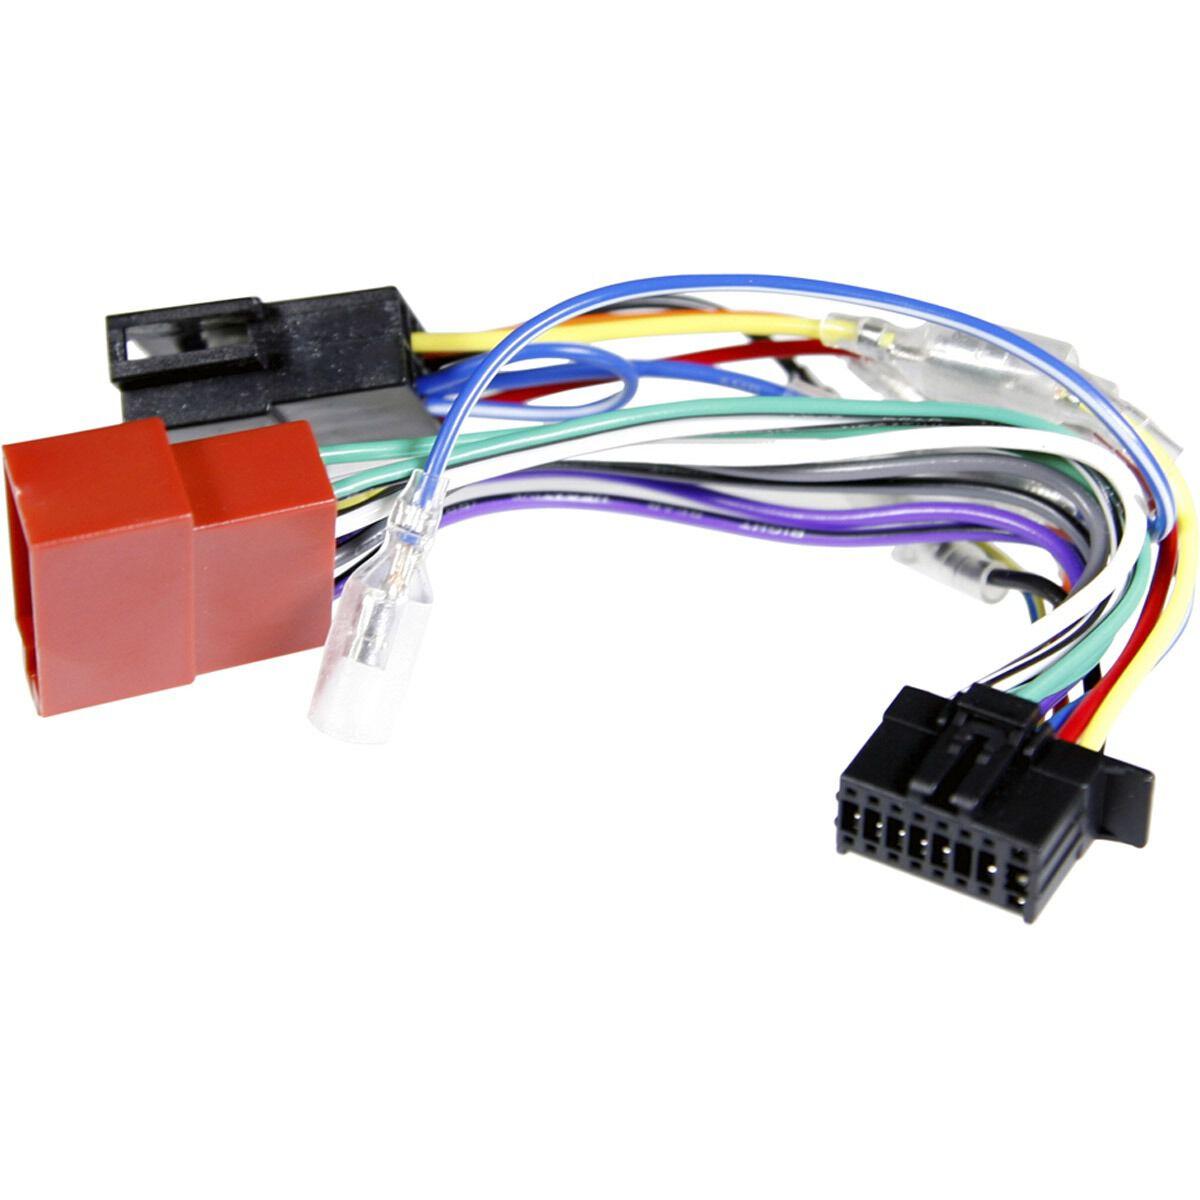 hight resolution of aerpro wiring harness suit jvc head units app8jvc5 jvc to pioneer wiring harness jvc wiring harness